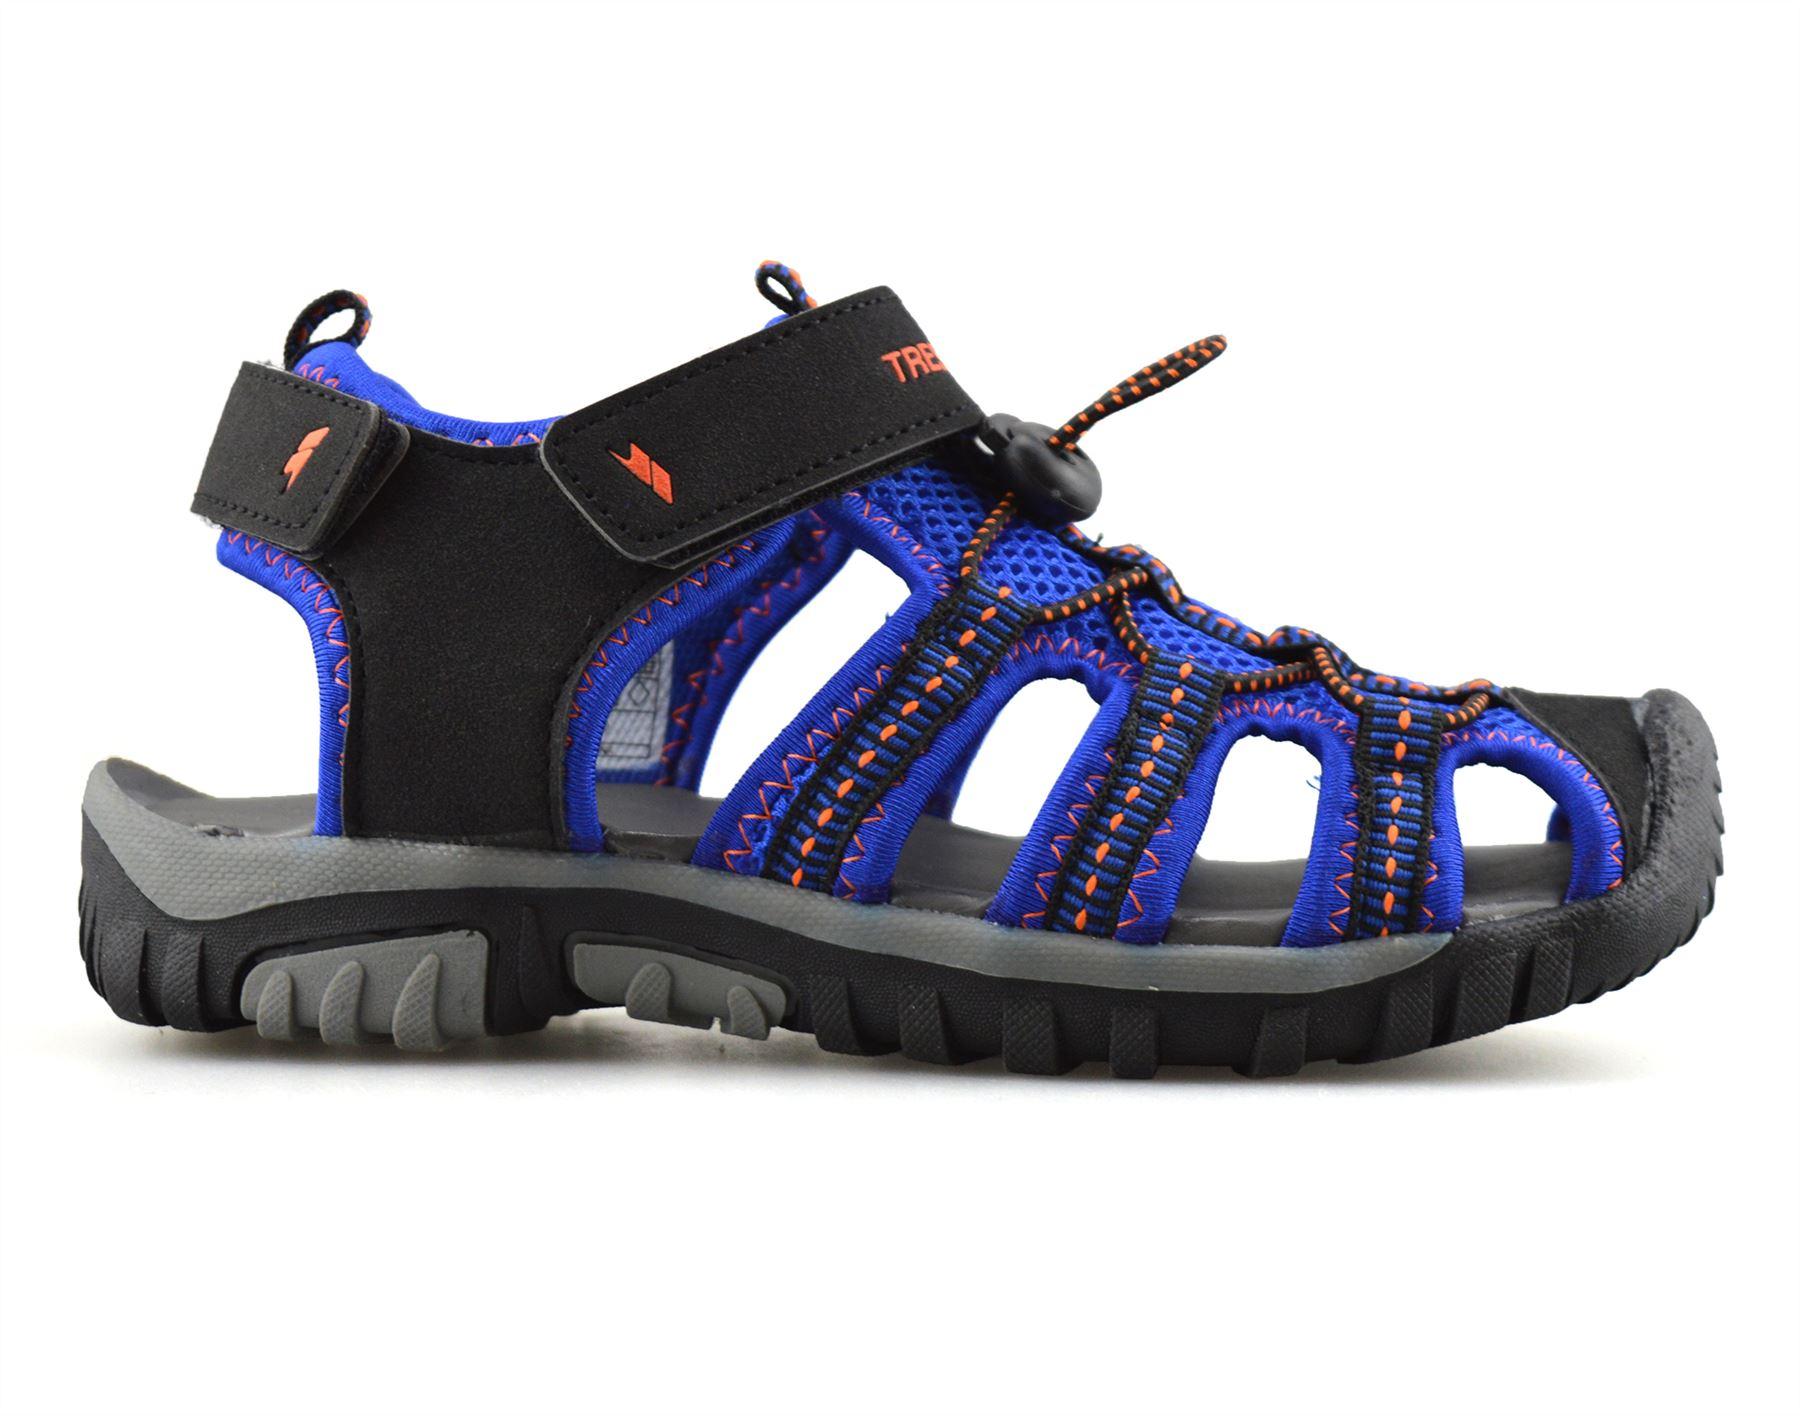 Boys-Girls-Kids-Trespass-Summer-Beach-Casual-Walking-Sports-Sandals-Shoes-Size thumbnail 11